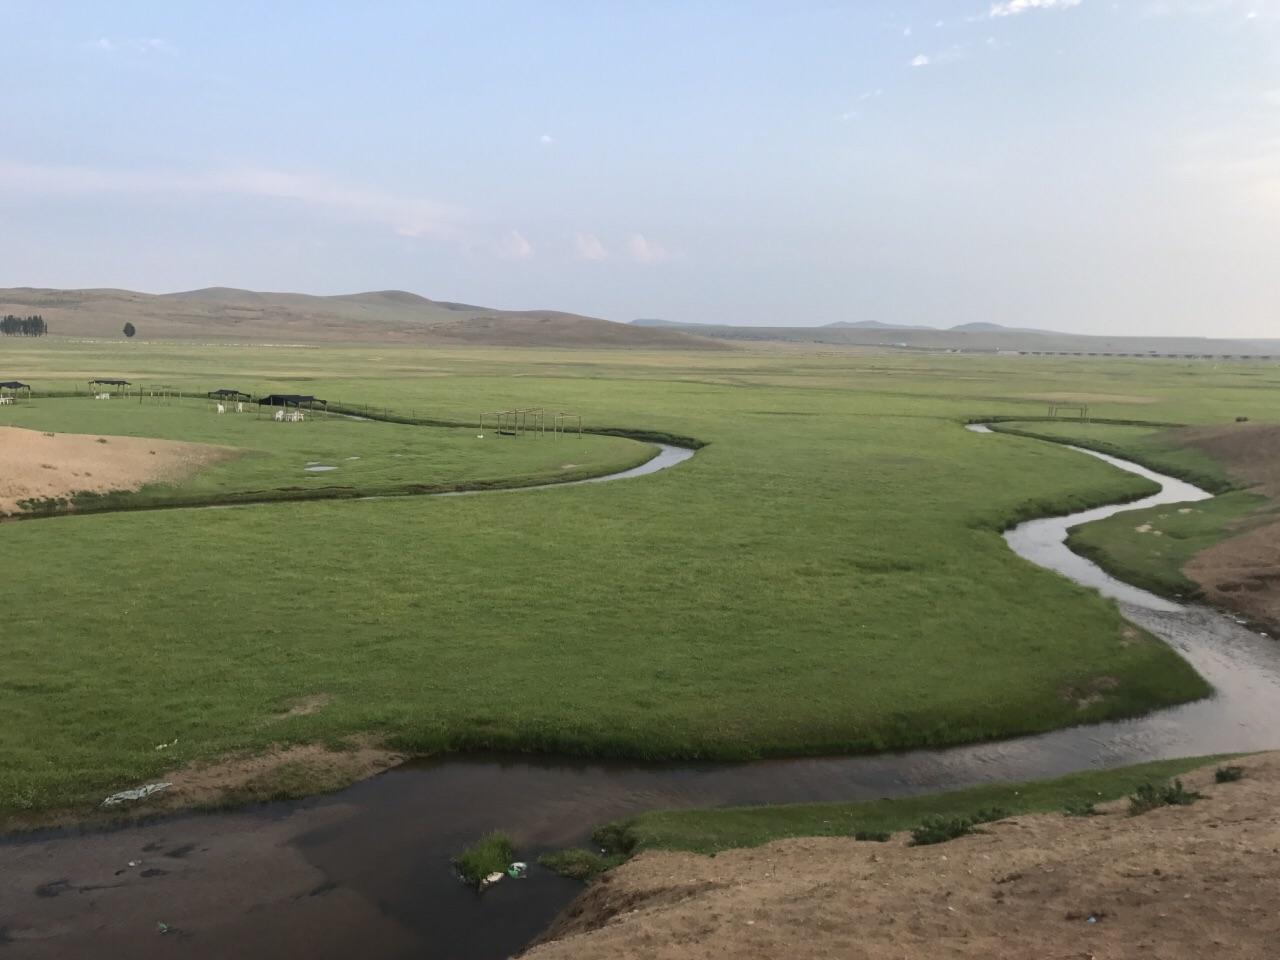 Baiyin Xilei Pasture Scenic Area